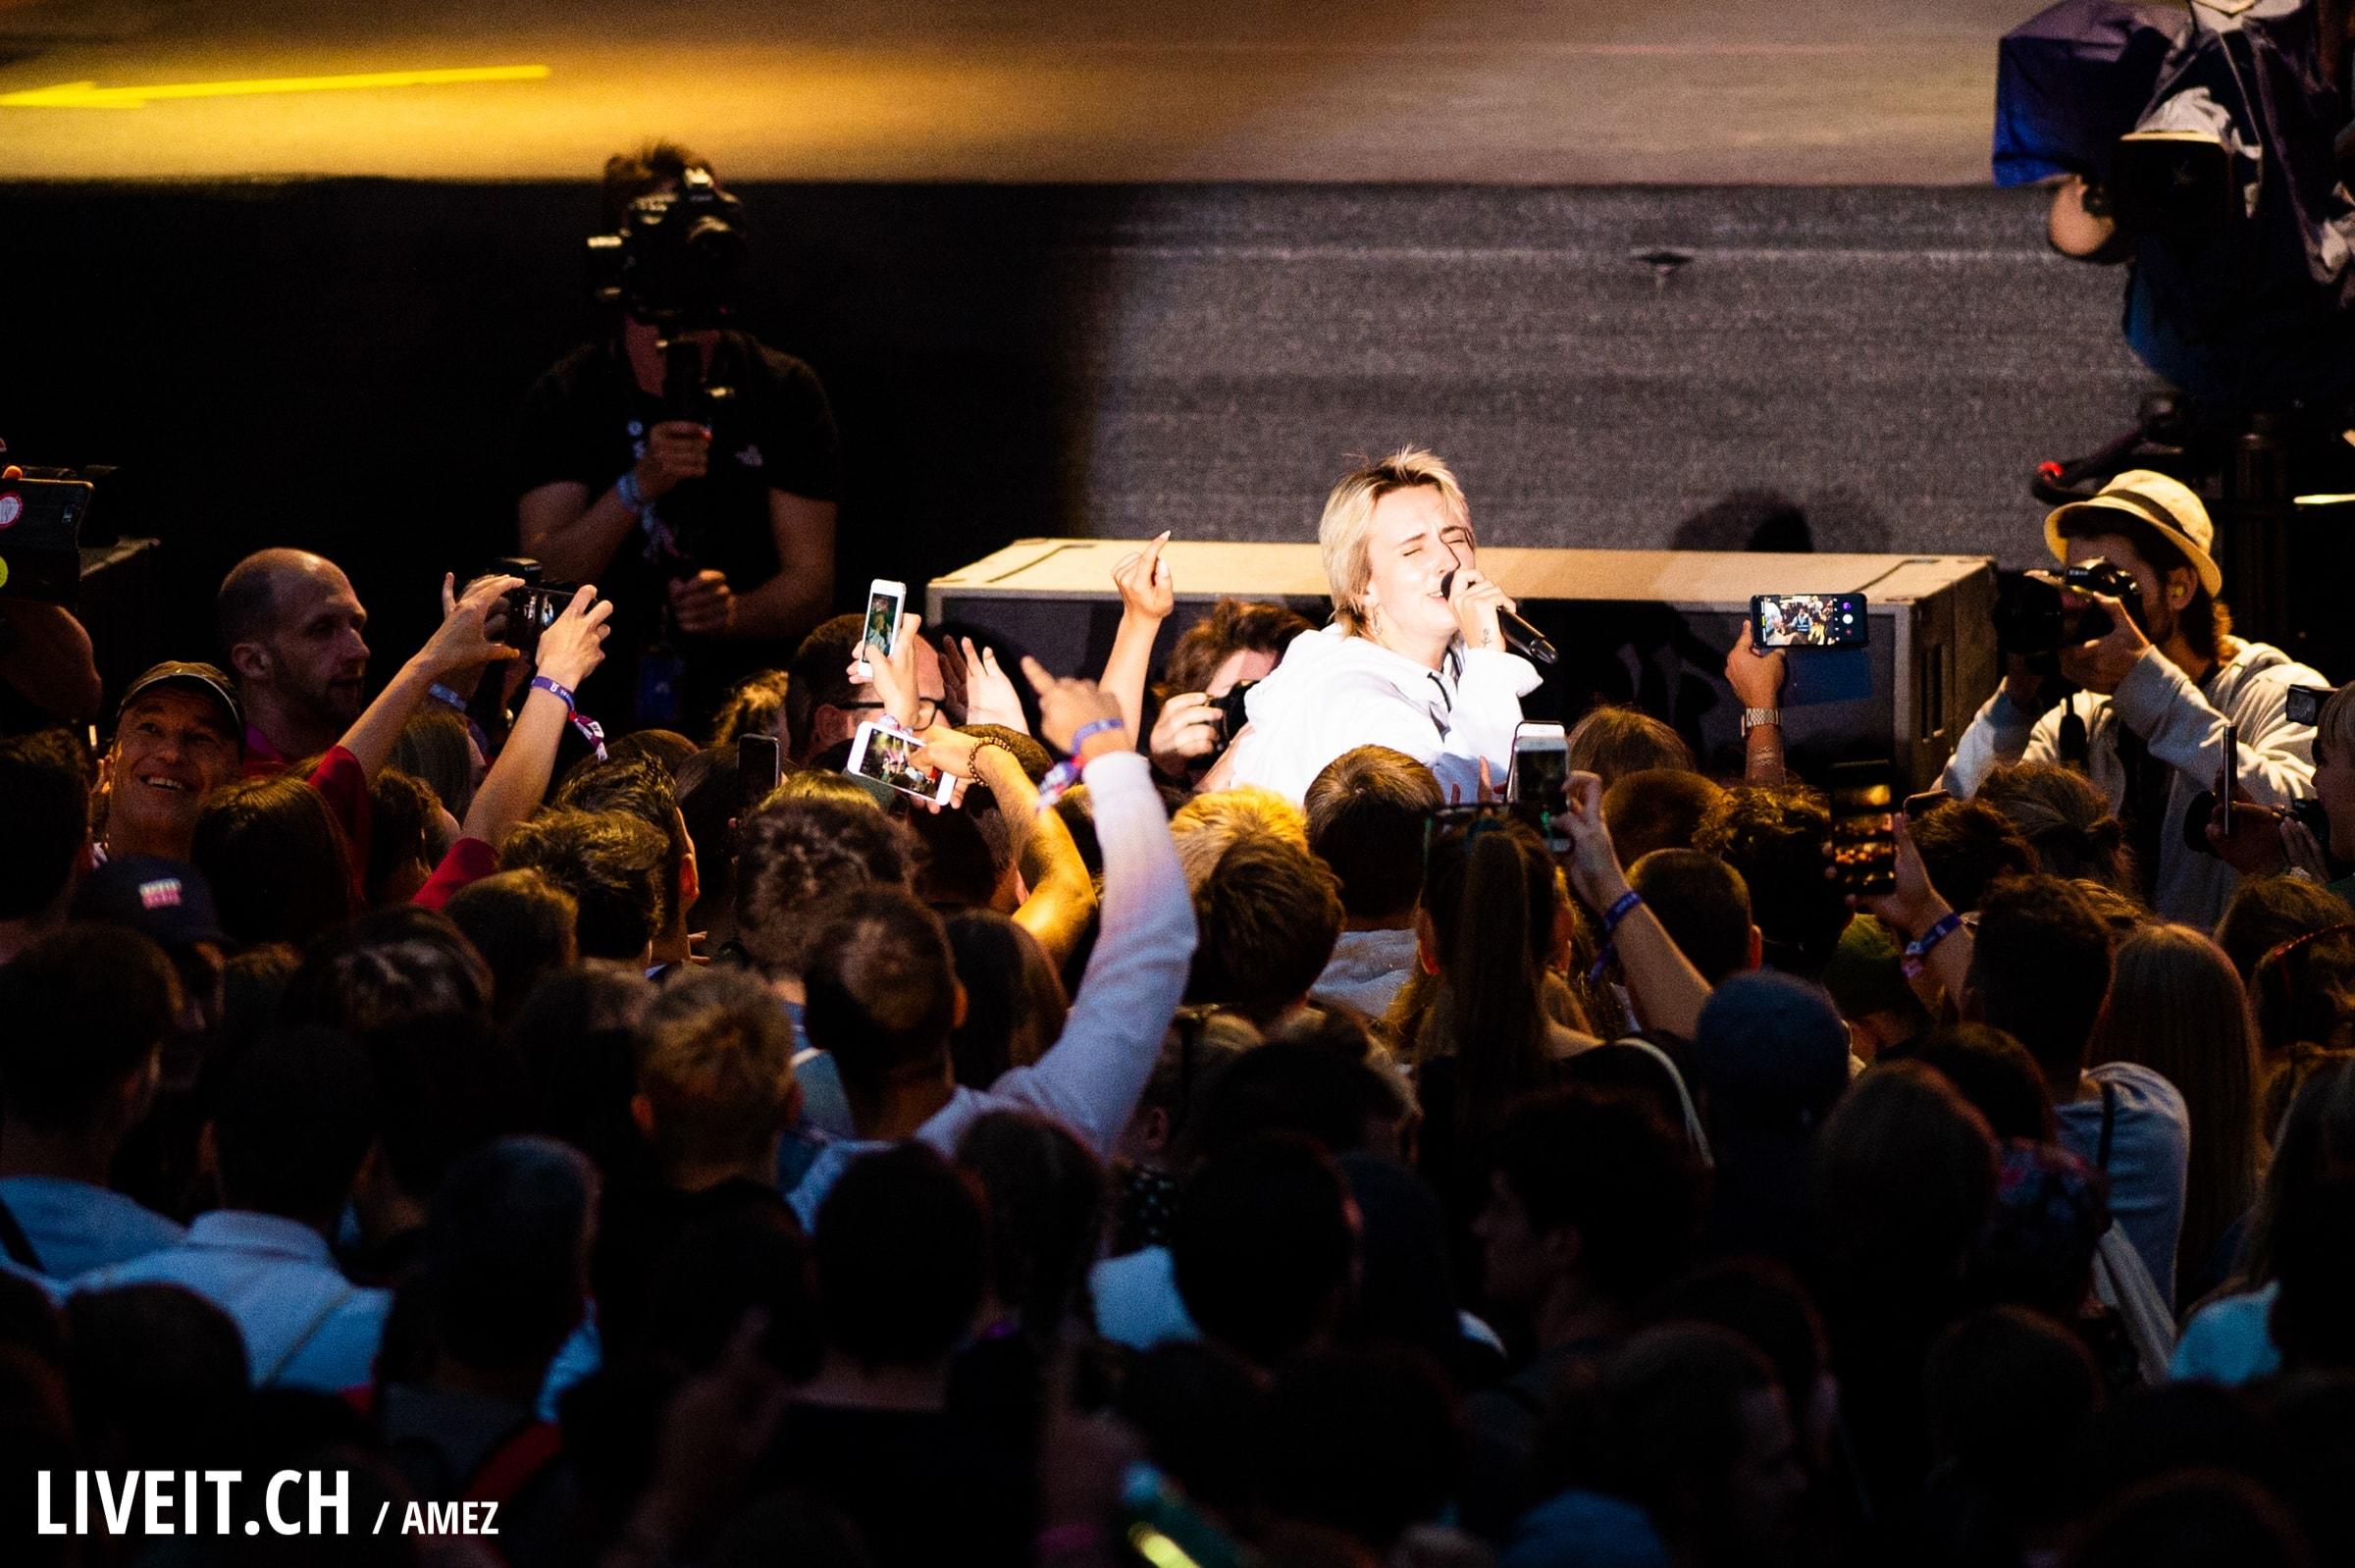 Mø auf der Hauptbühne fotografiert am Gurtenfestival 2018 in Bern. (Pascale Amez for Gurtenfestival)